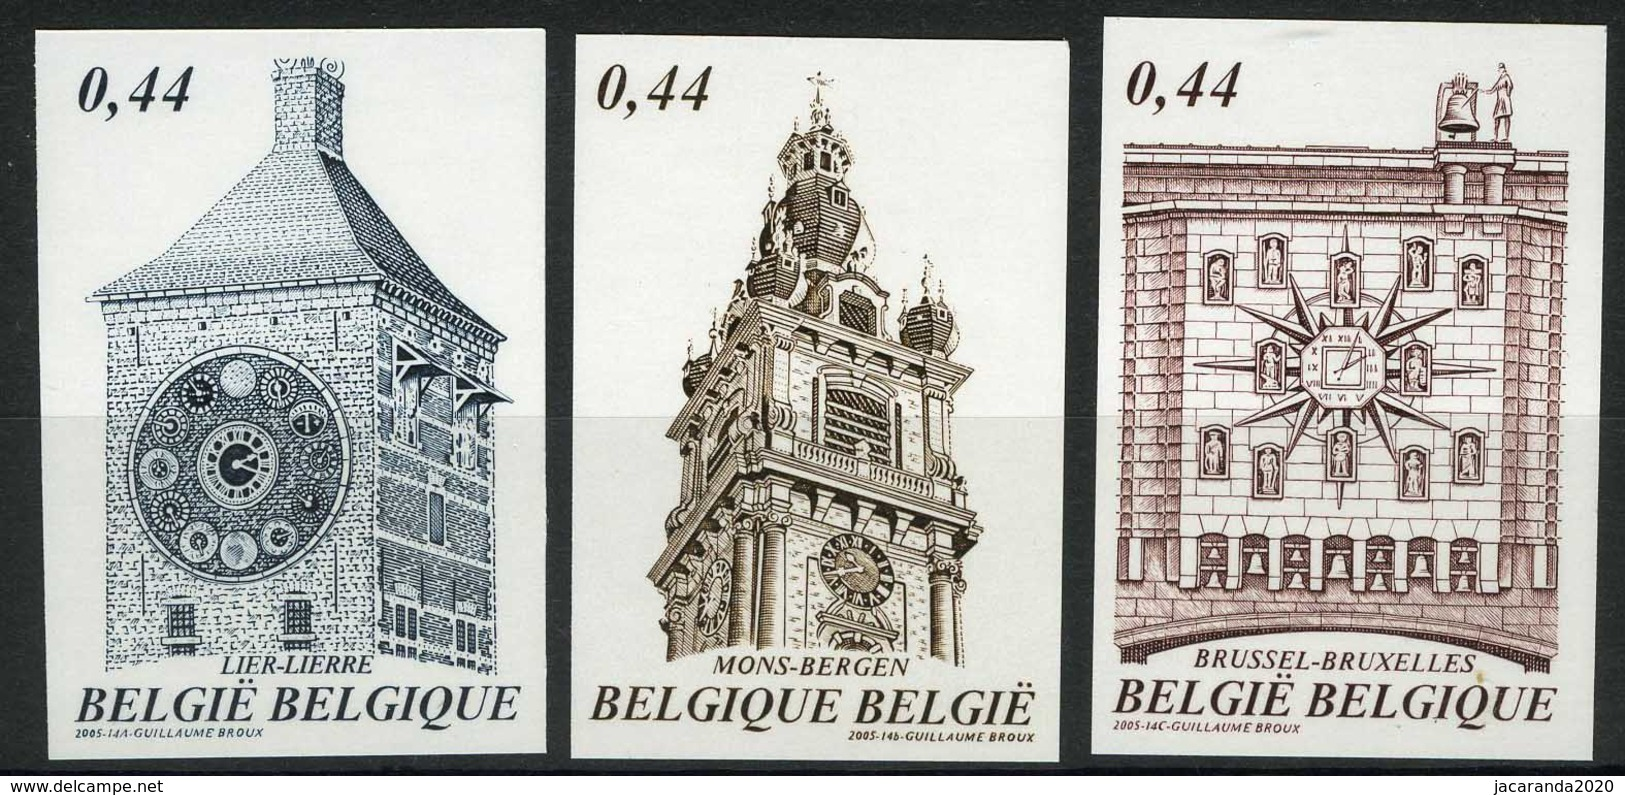 [A2963] België 3396/98 – Toerisme – Uurwerken – Zimmertoren – Tour De L'horloge – ON – Cote: € 30,00 - België